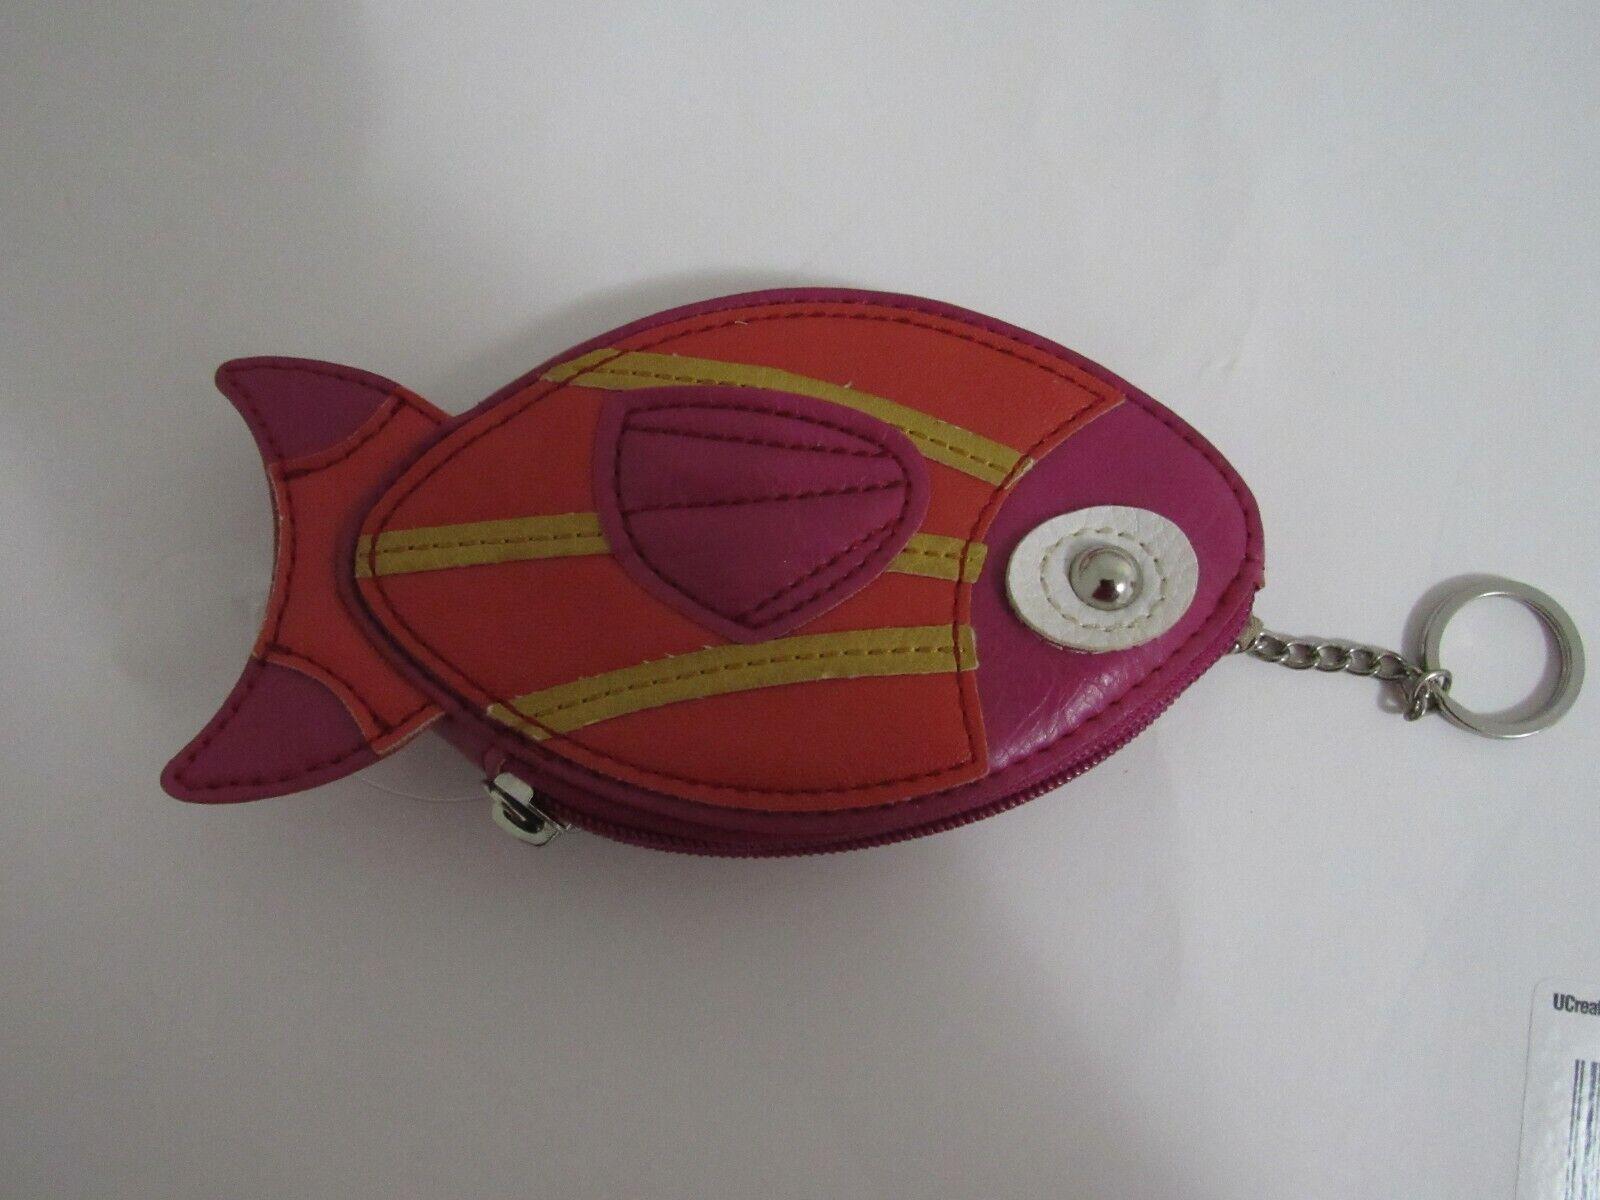 New NO TAG Relic mutil color PVC fish coin purse key chain